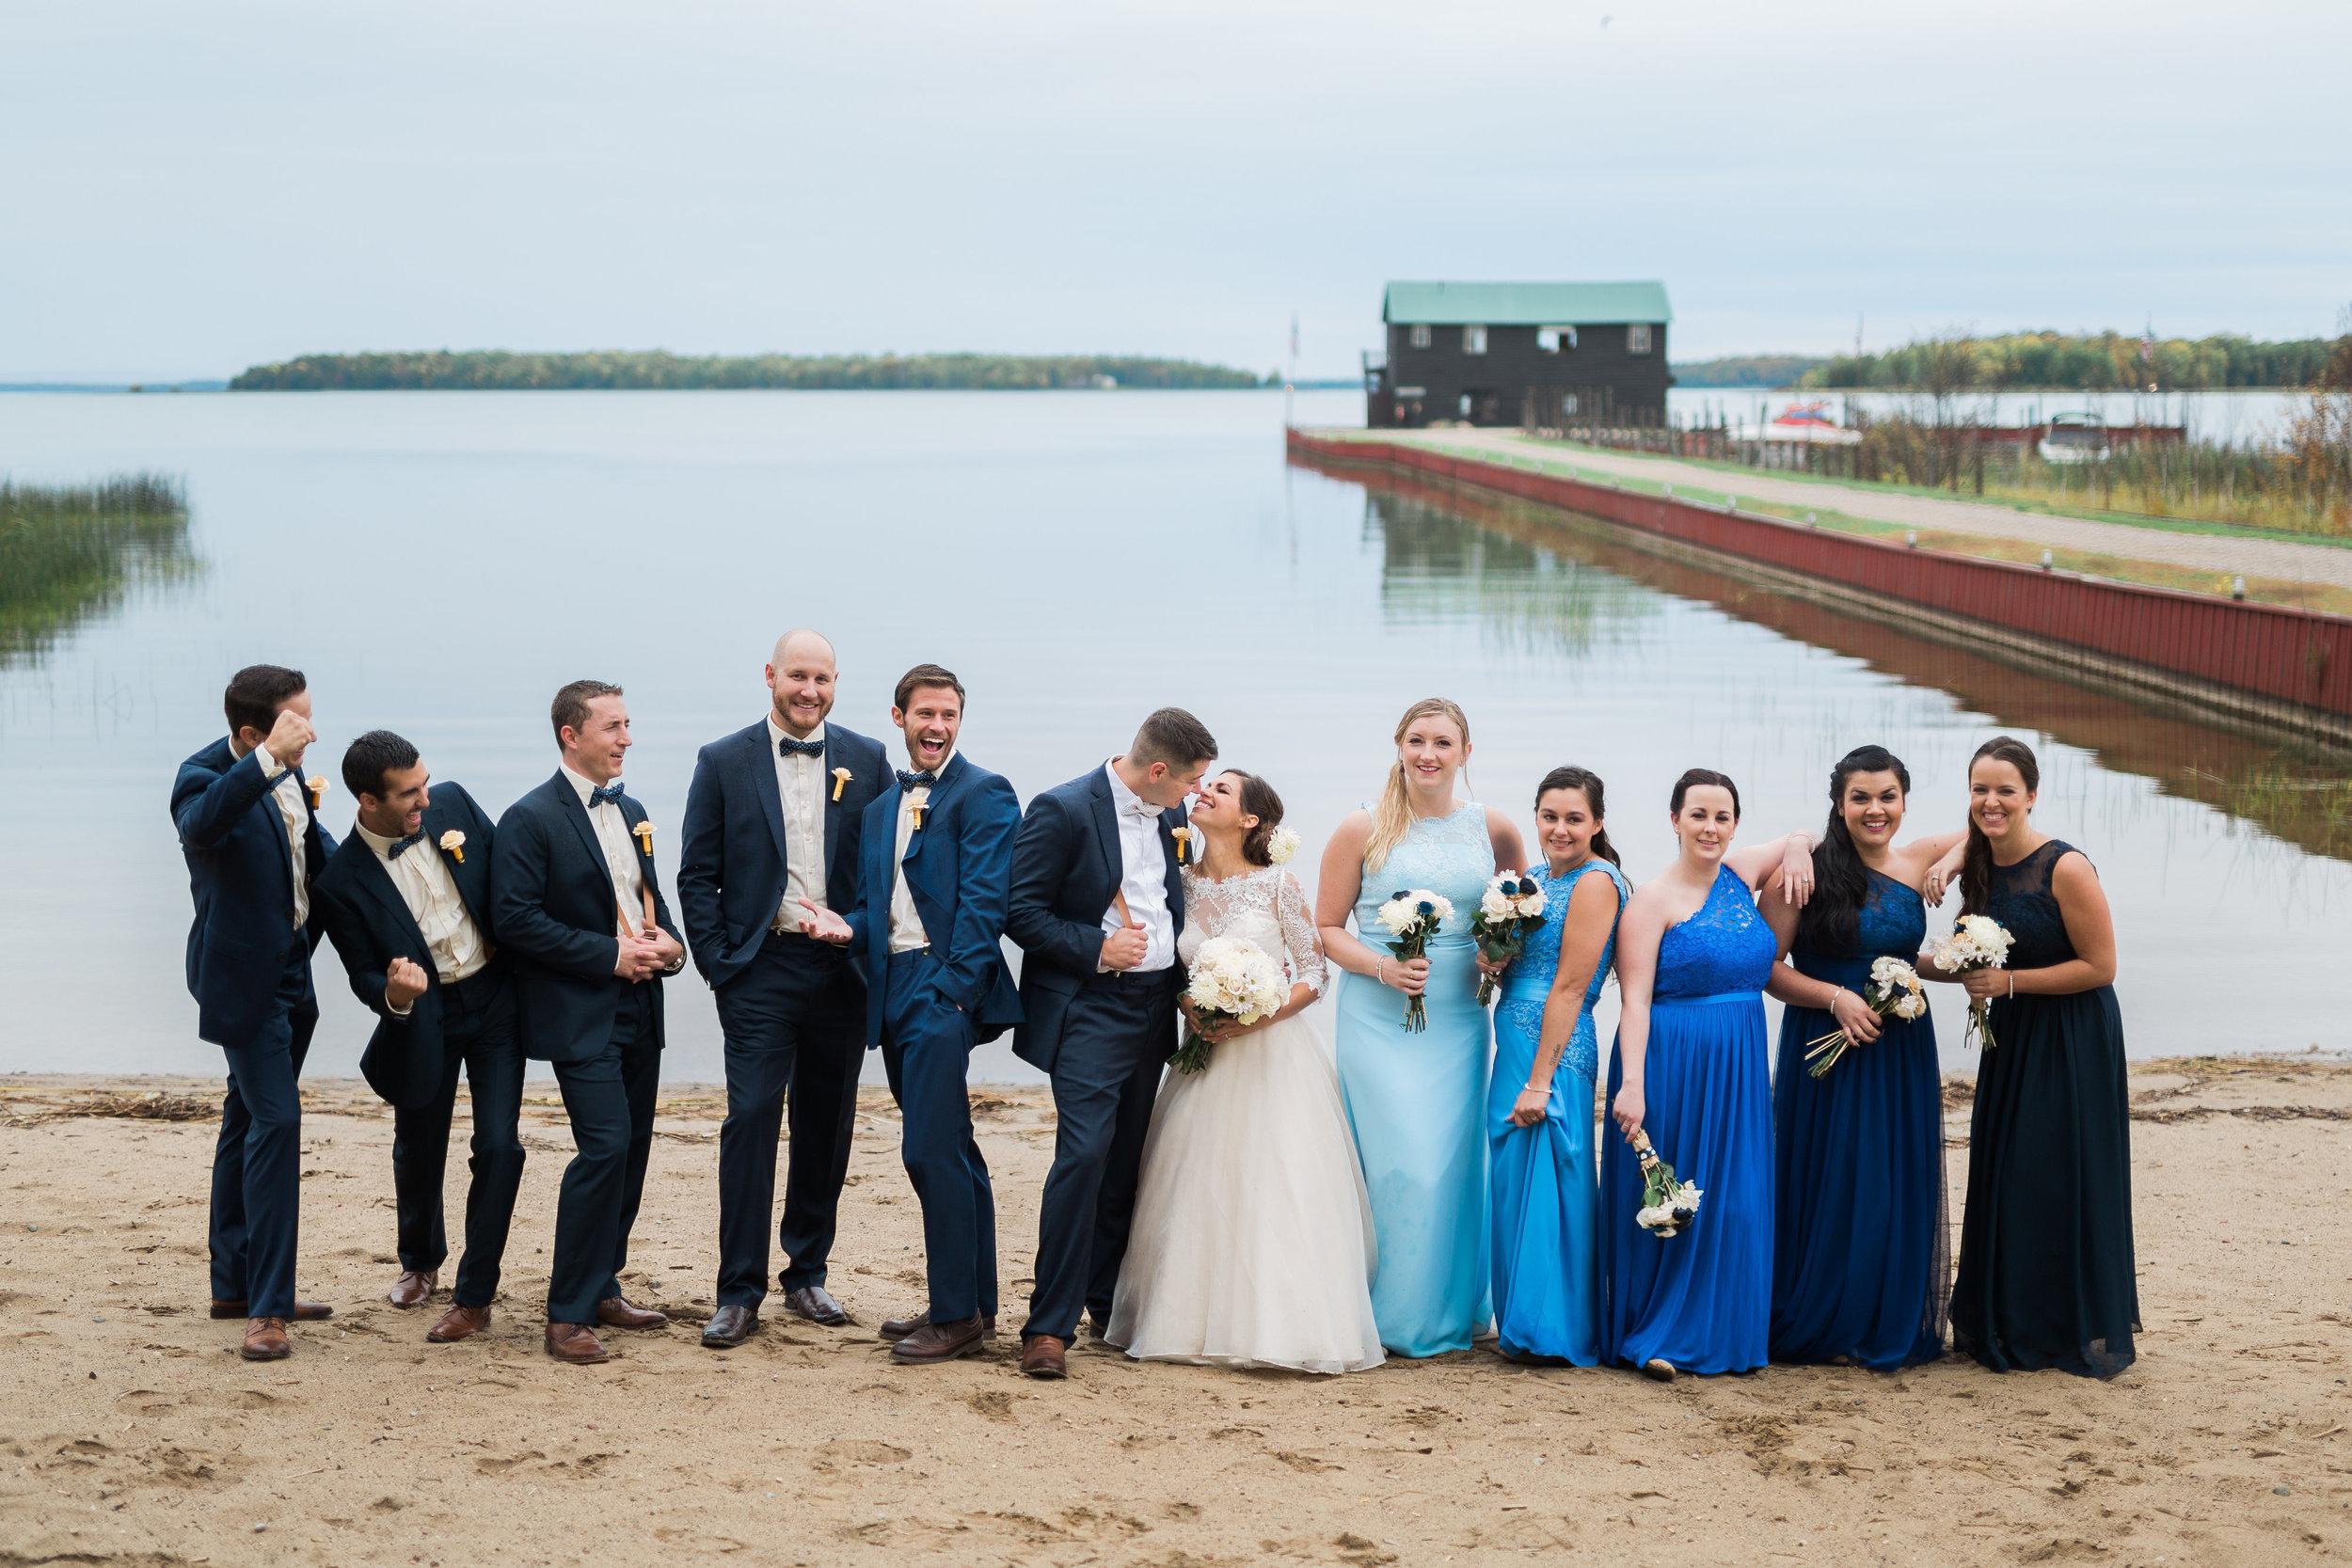 Northern-michigan-wedding-drummond-island.jpg